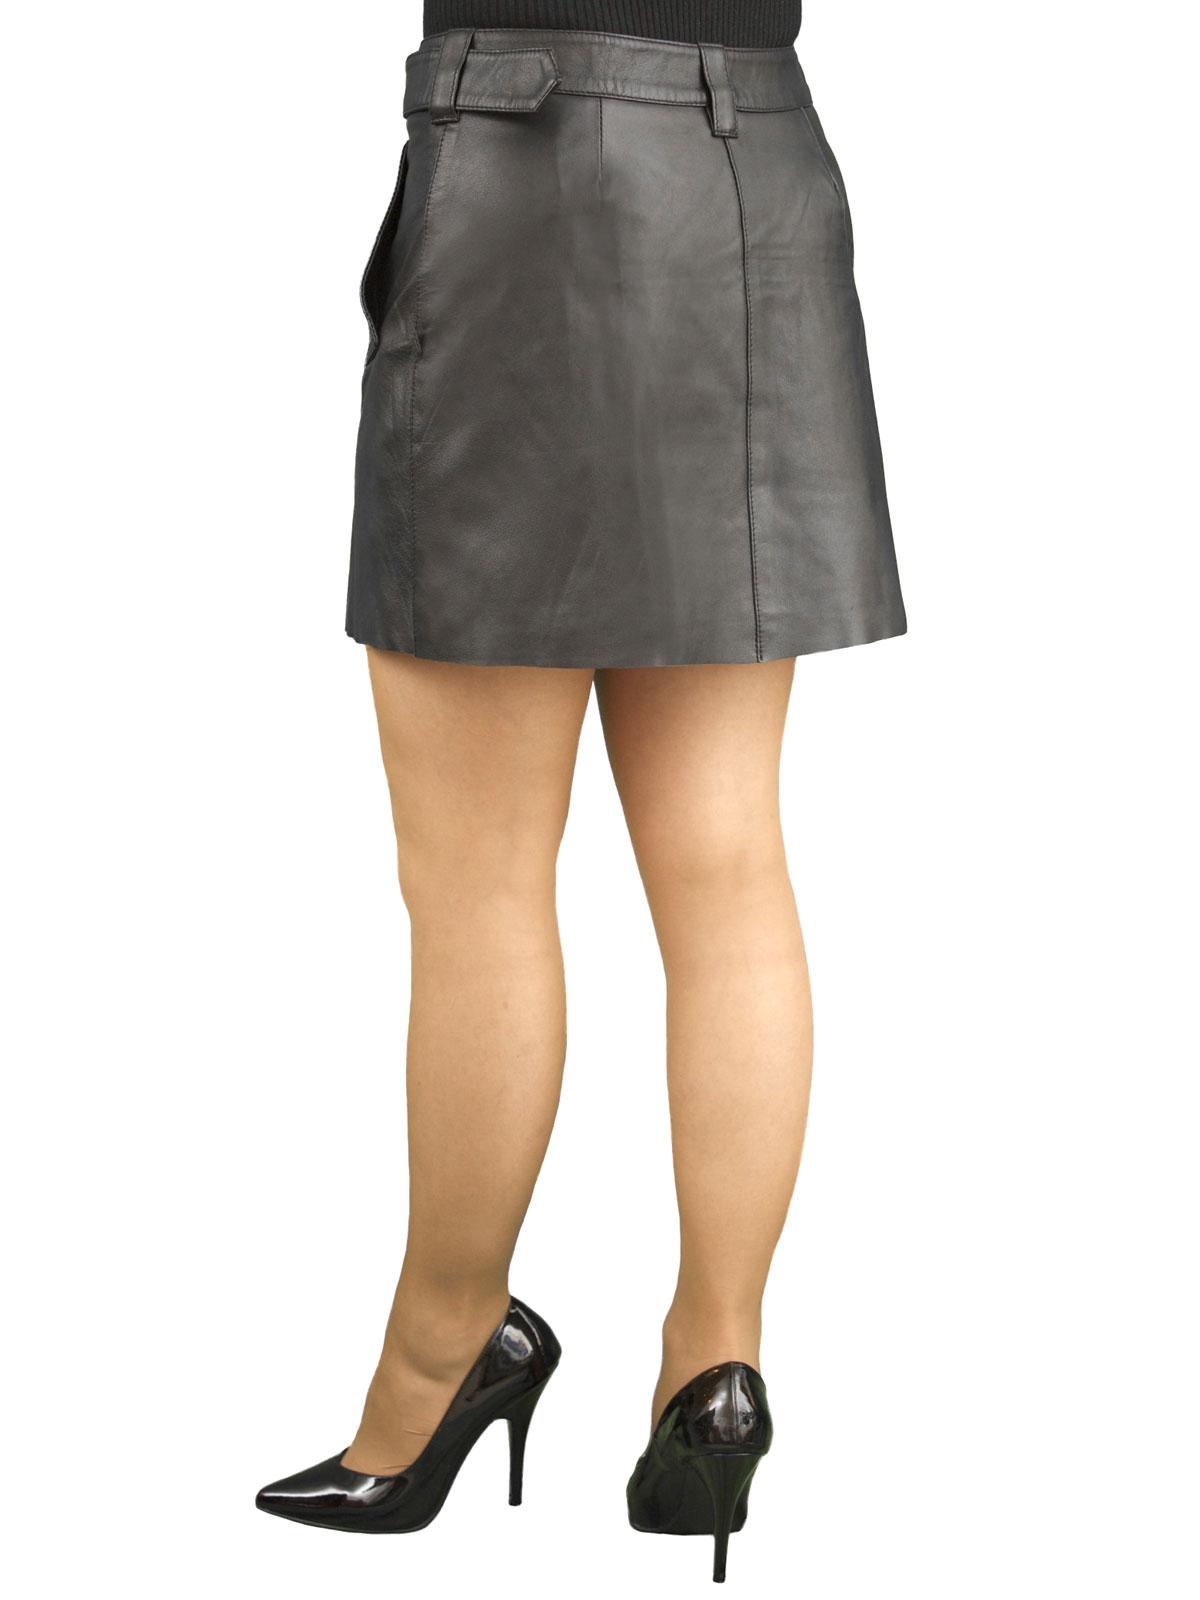 Black Leather Hipster Mini Skirt, buckle belt - Tout Ensemble